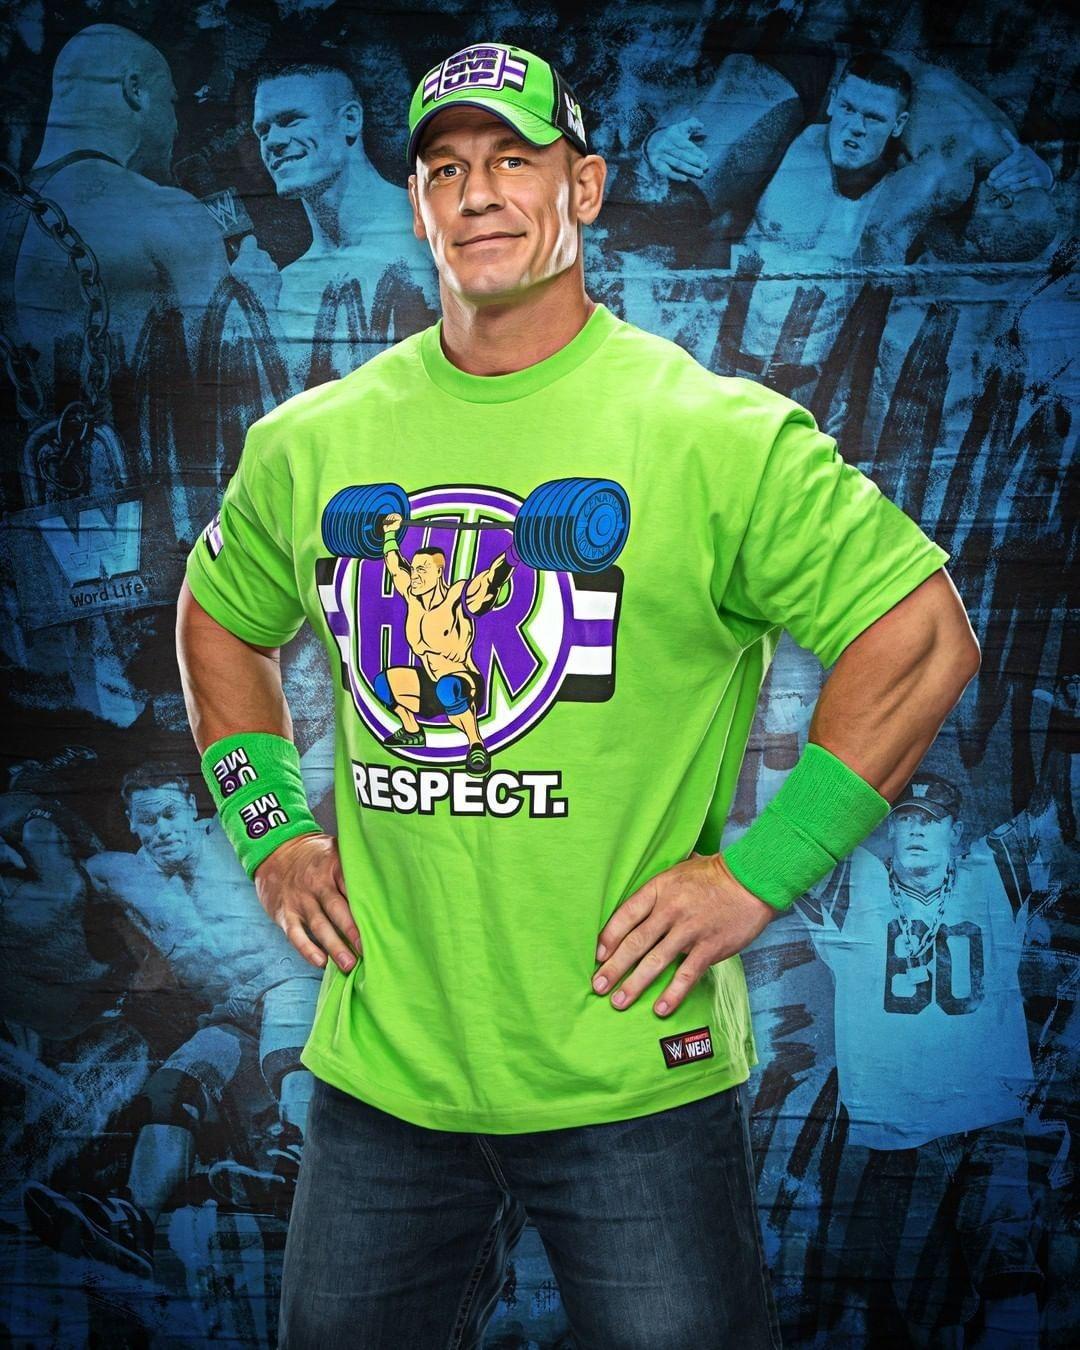 John Cena 2020 Wallpapers - Wallpaper Cave